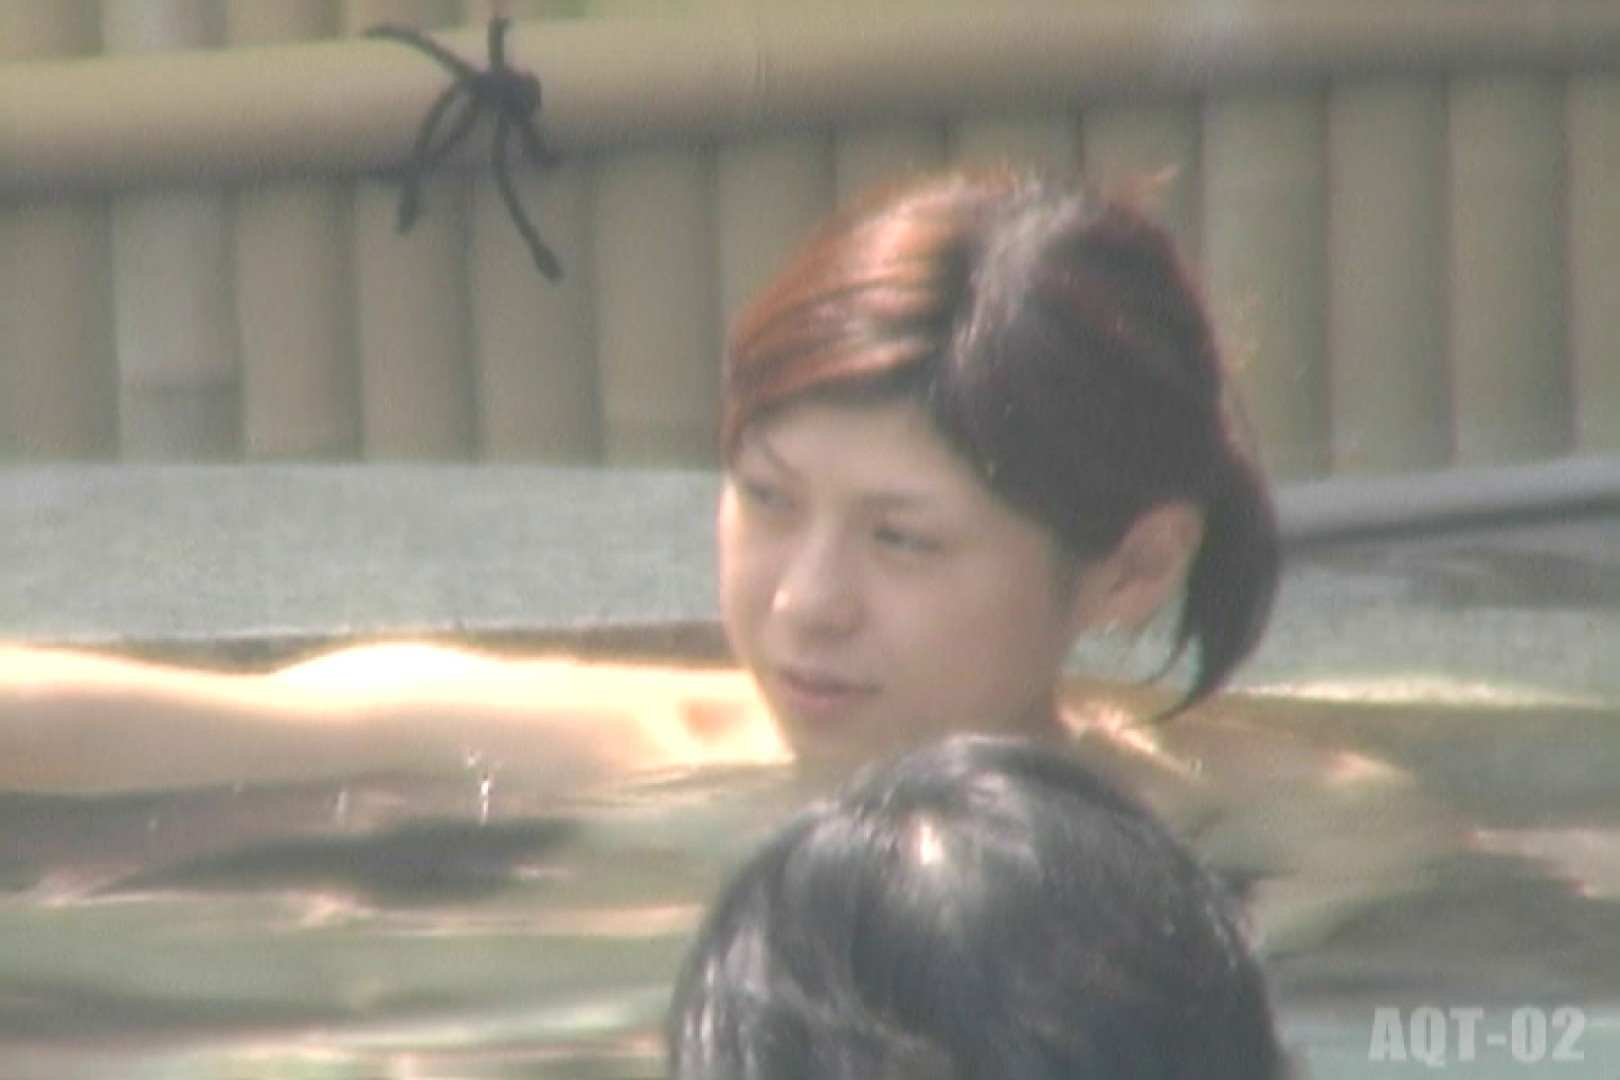 Aquaな露天風呂Vol.726 OLのエロ生活 おまんこ無修正動画無料 84連発 38